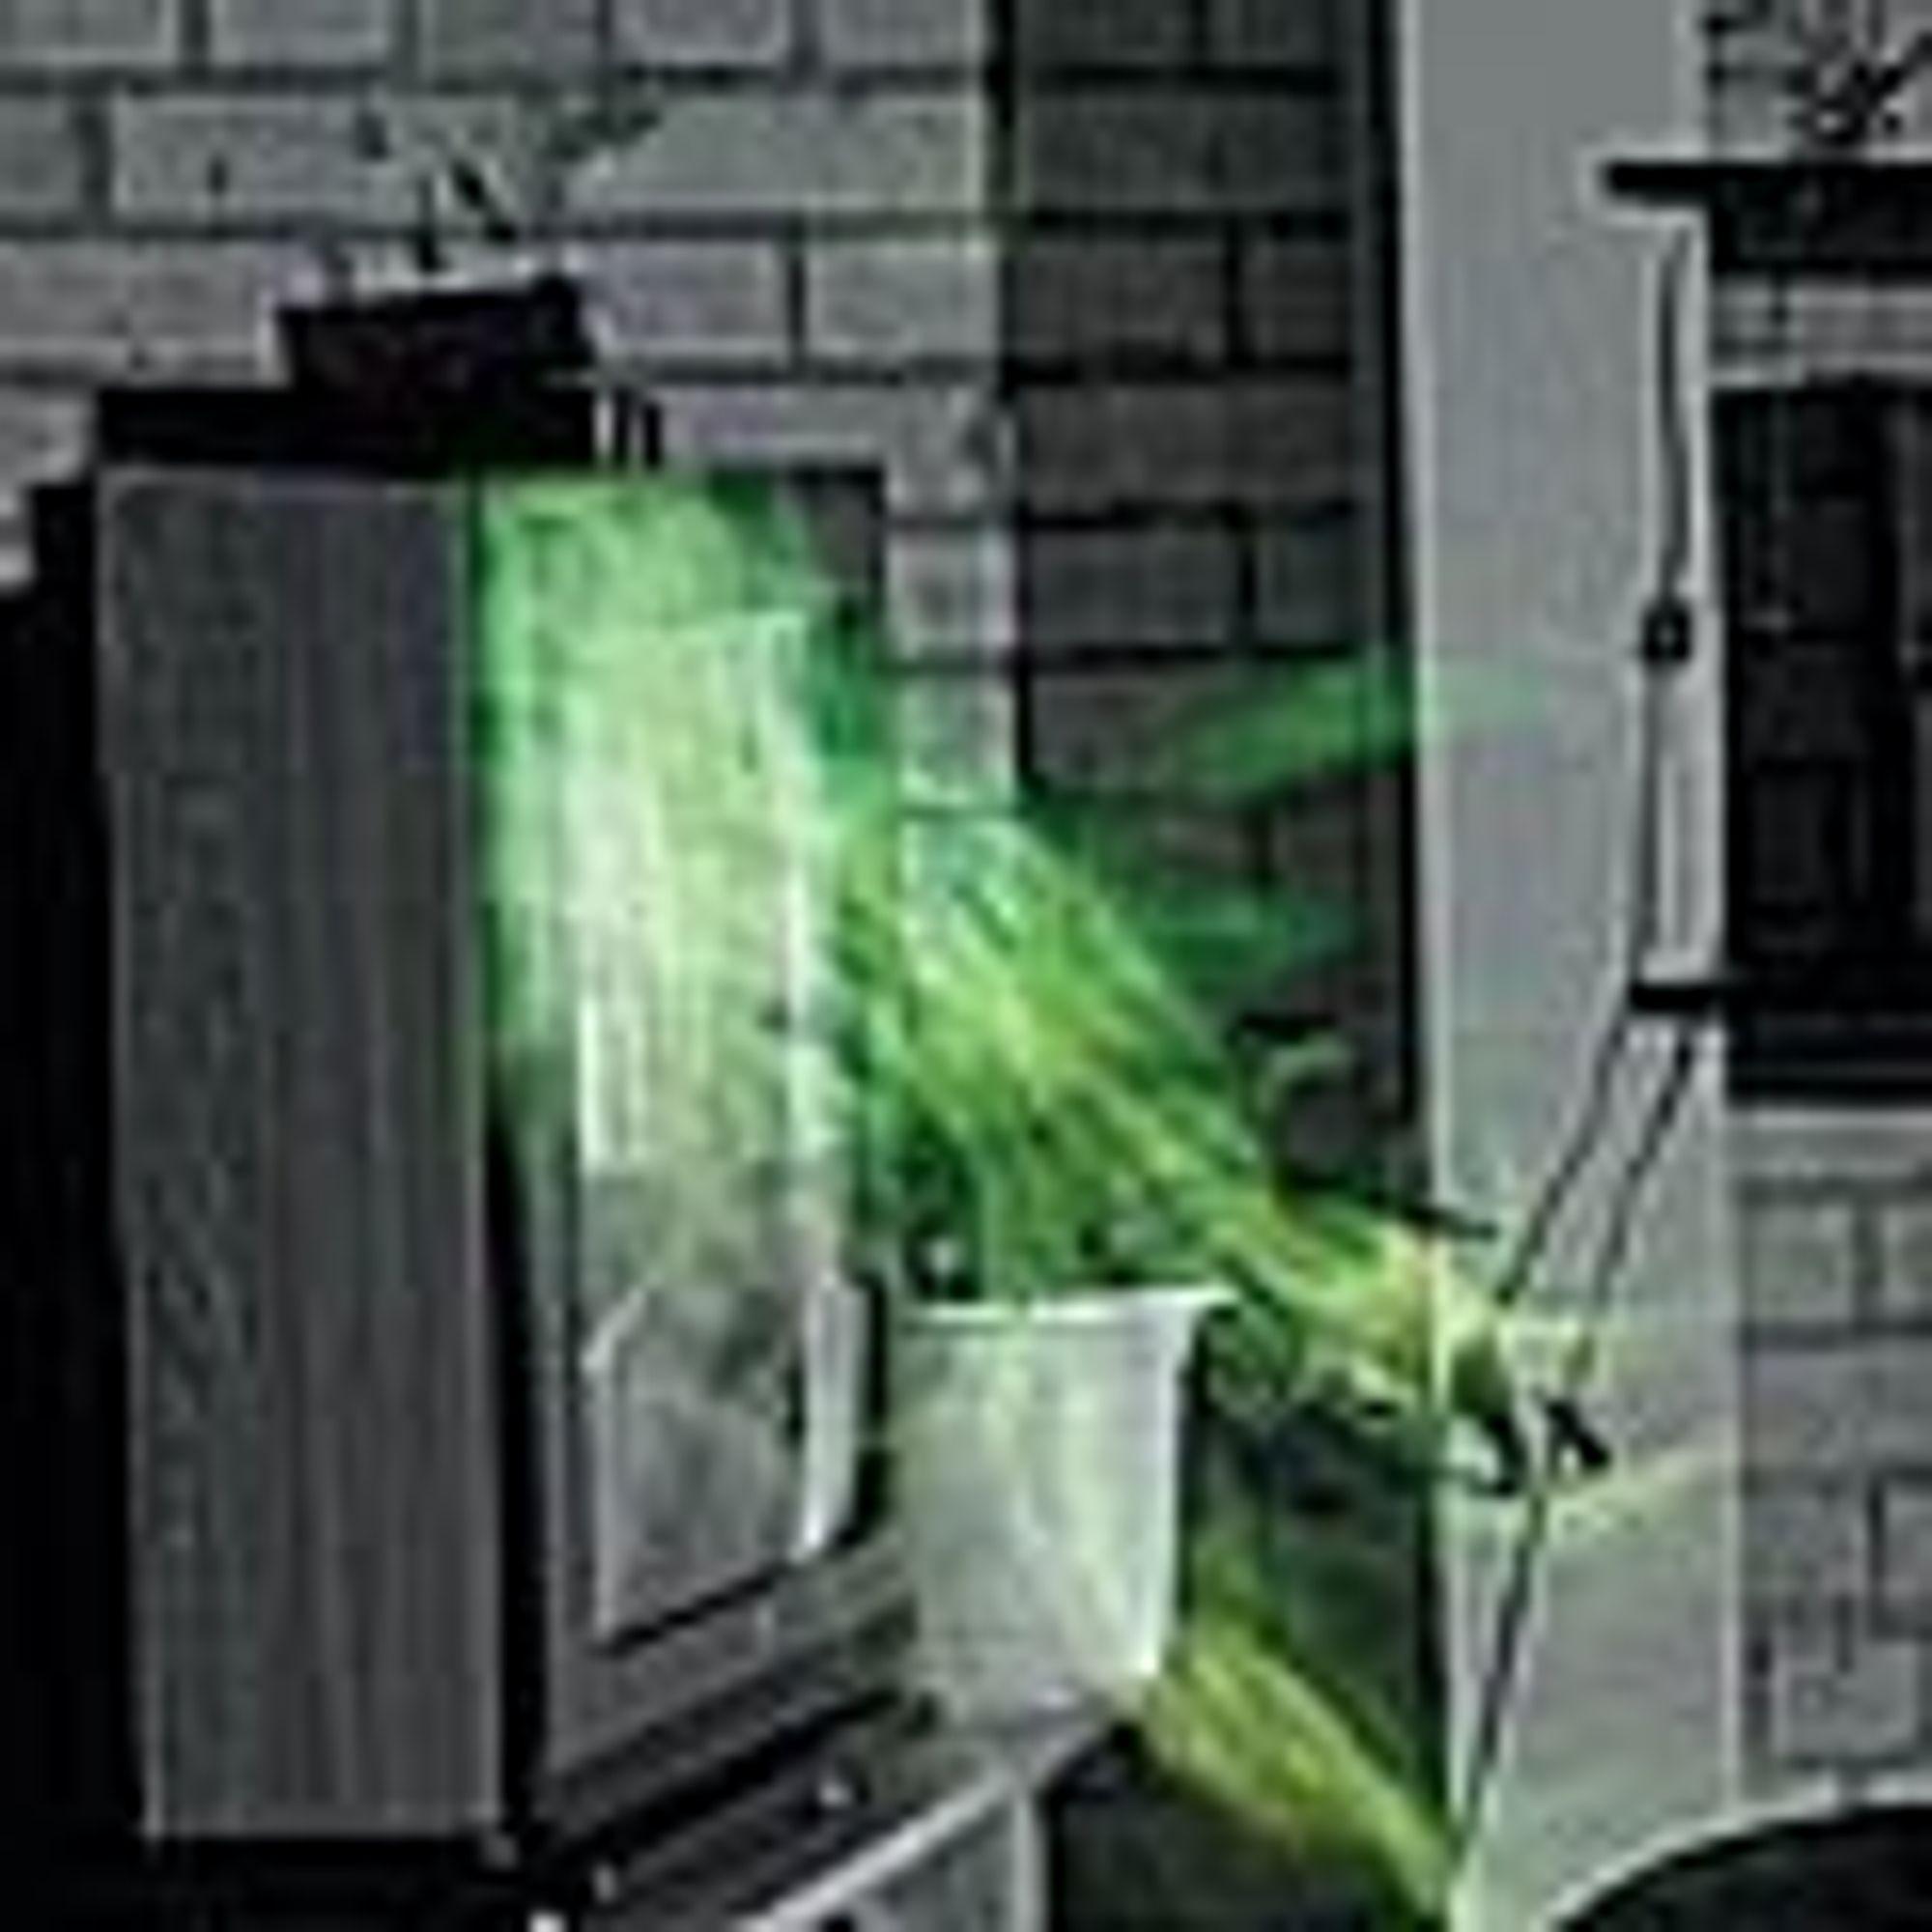 Kaster du den gamle TV'n på fyllinga utgjøre den en miljøtrussel.Foto: Arkiv